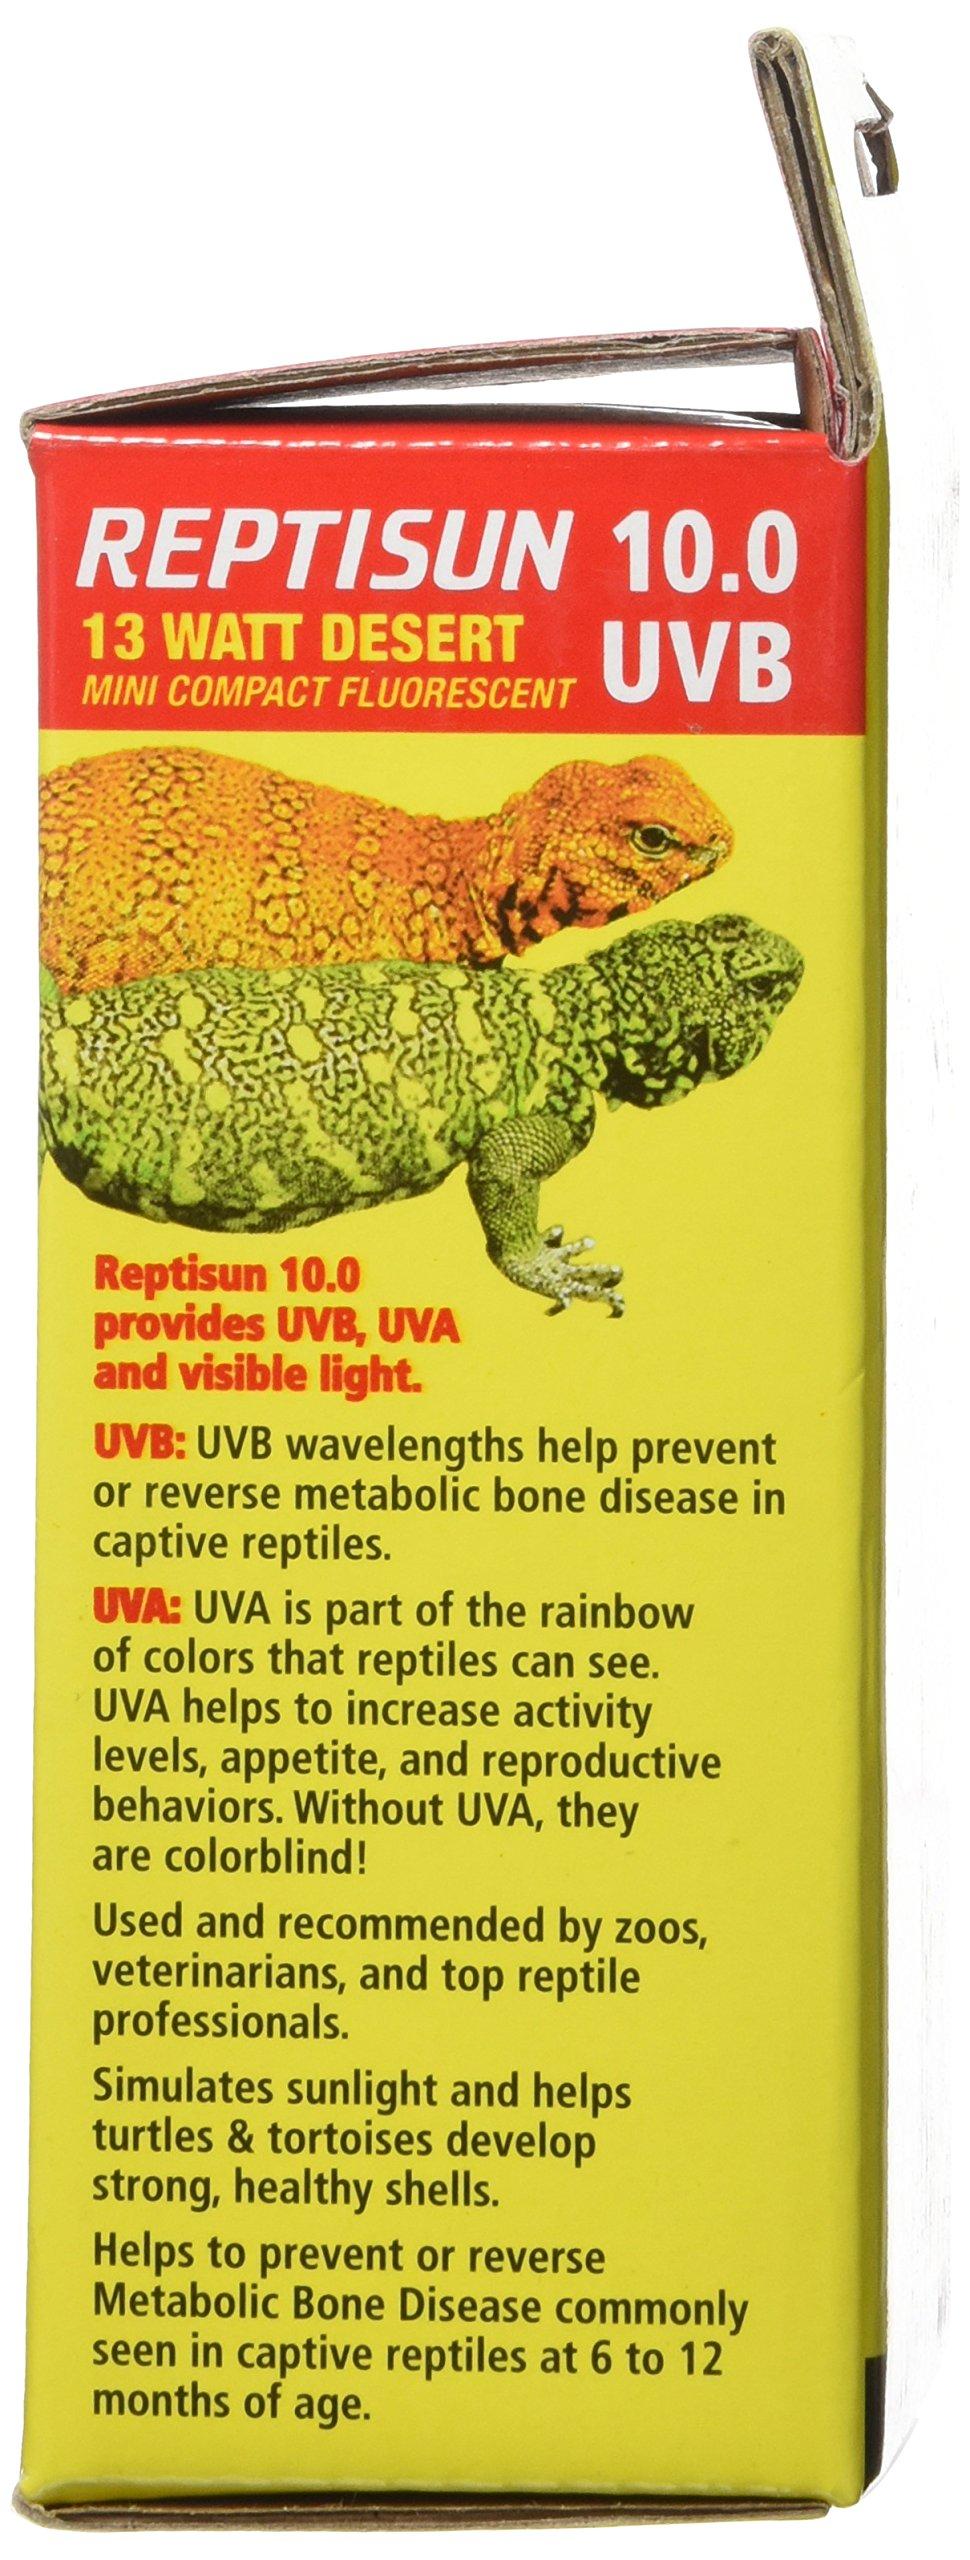 Reptisun 10.0 Uvb Mini Compact Fluorescent 13 Watt by Zoo Med (Image #4)